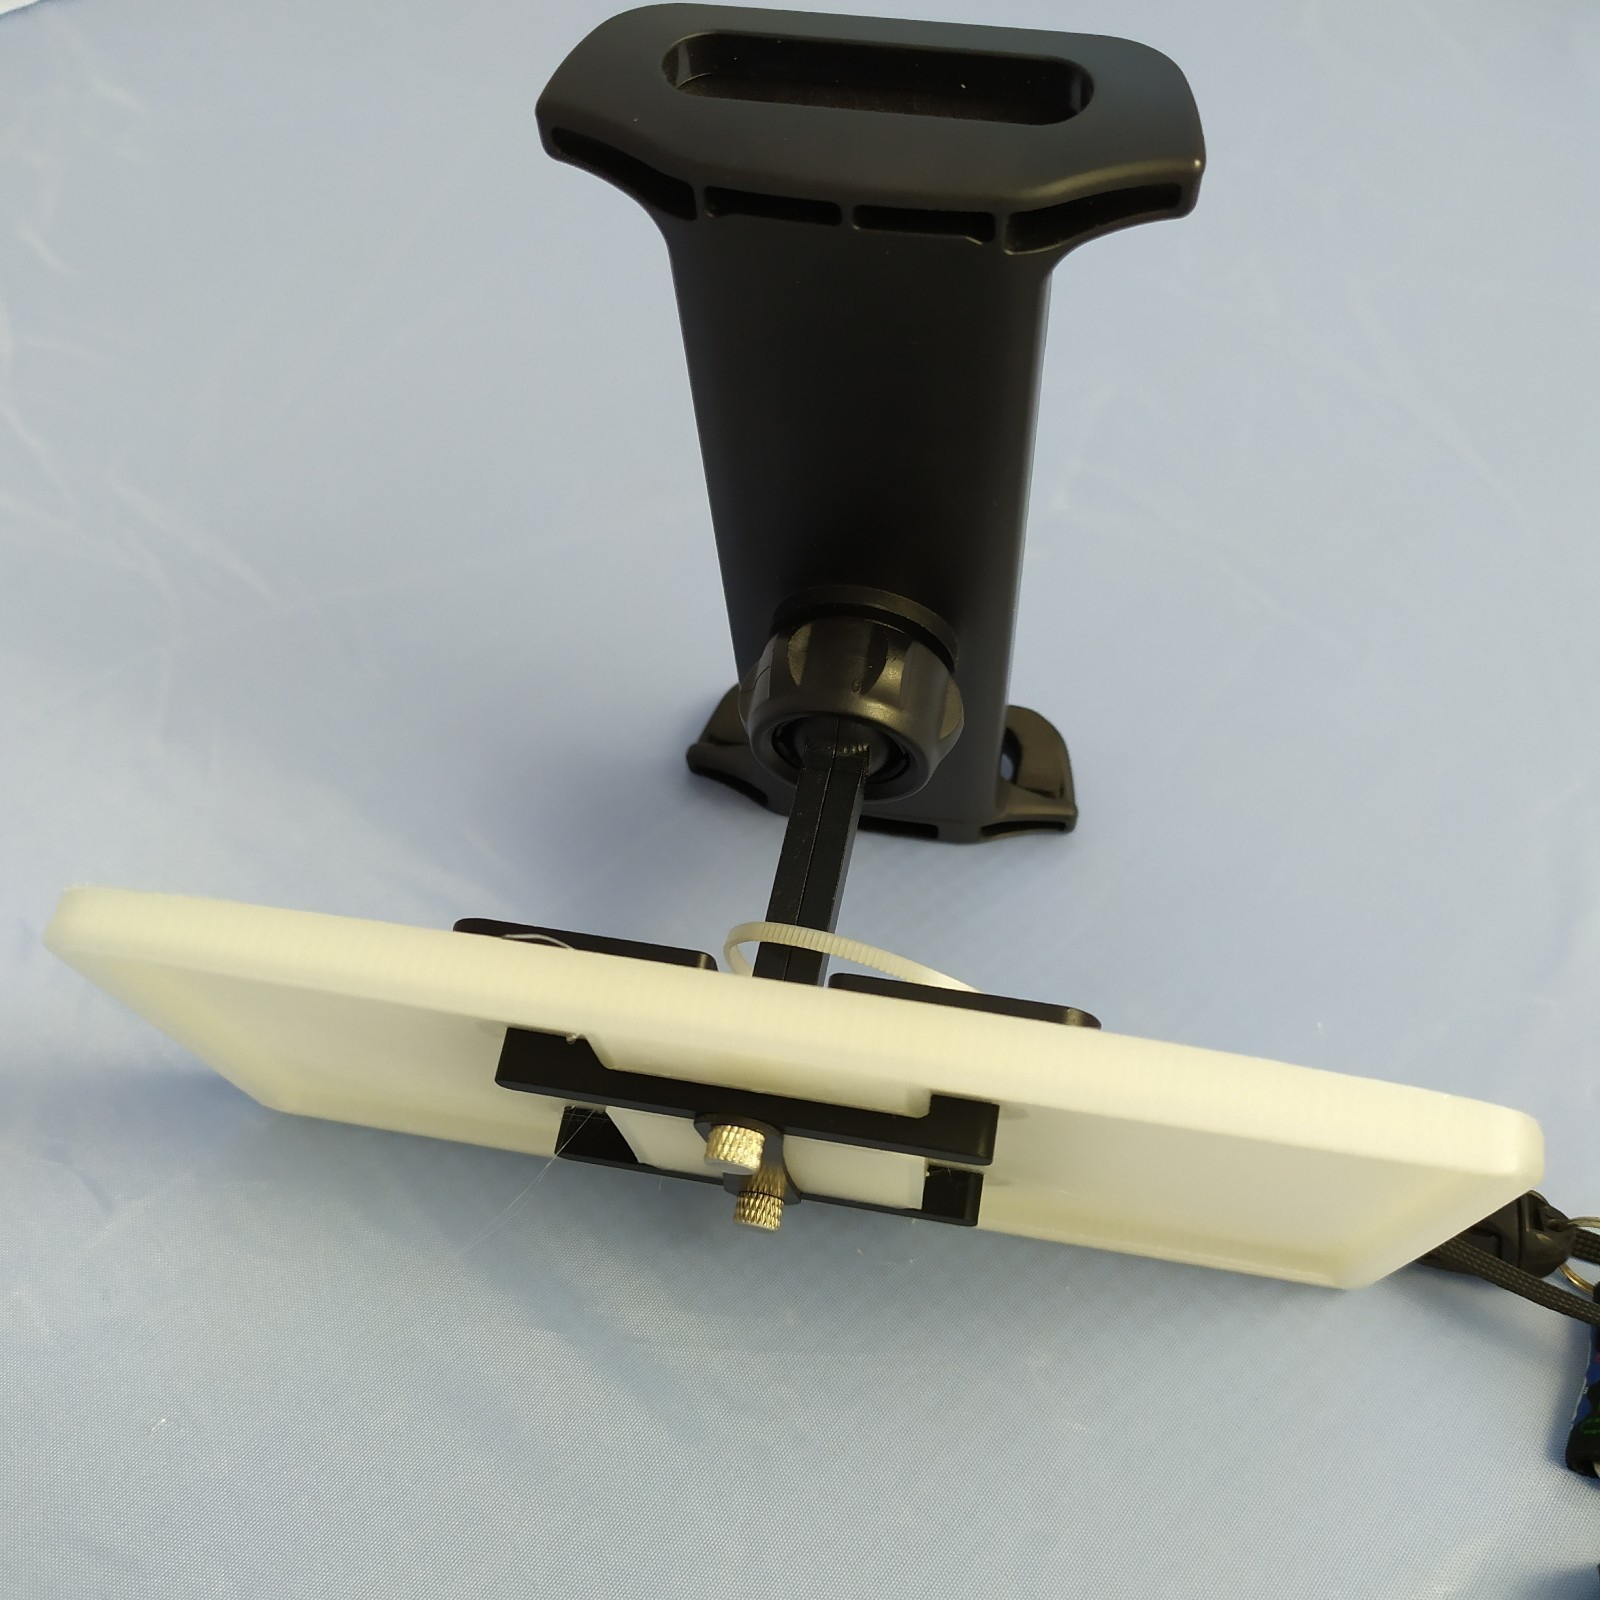 3D Printed Tablet Holder Adapter DJi Mavic 2 - Holder Parrot Anafi